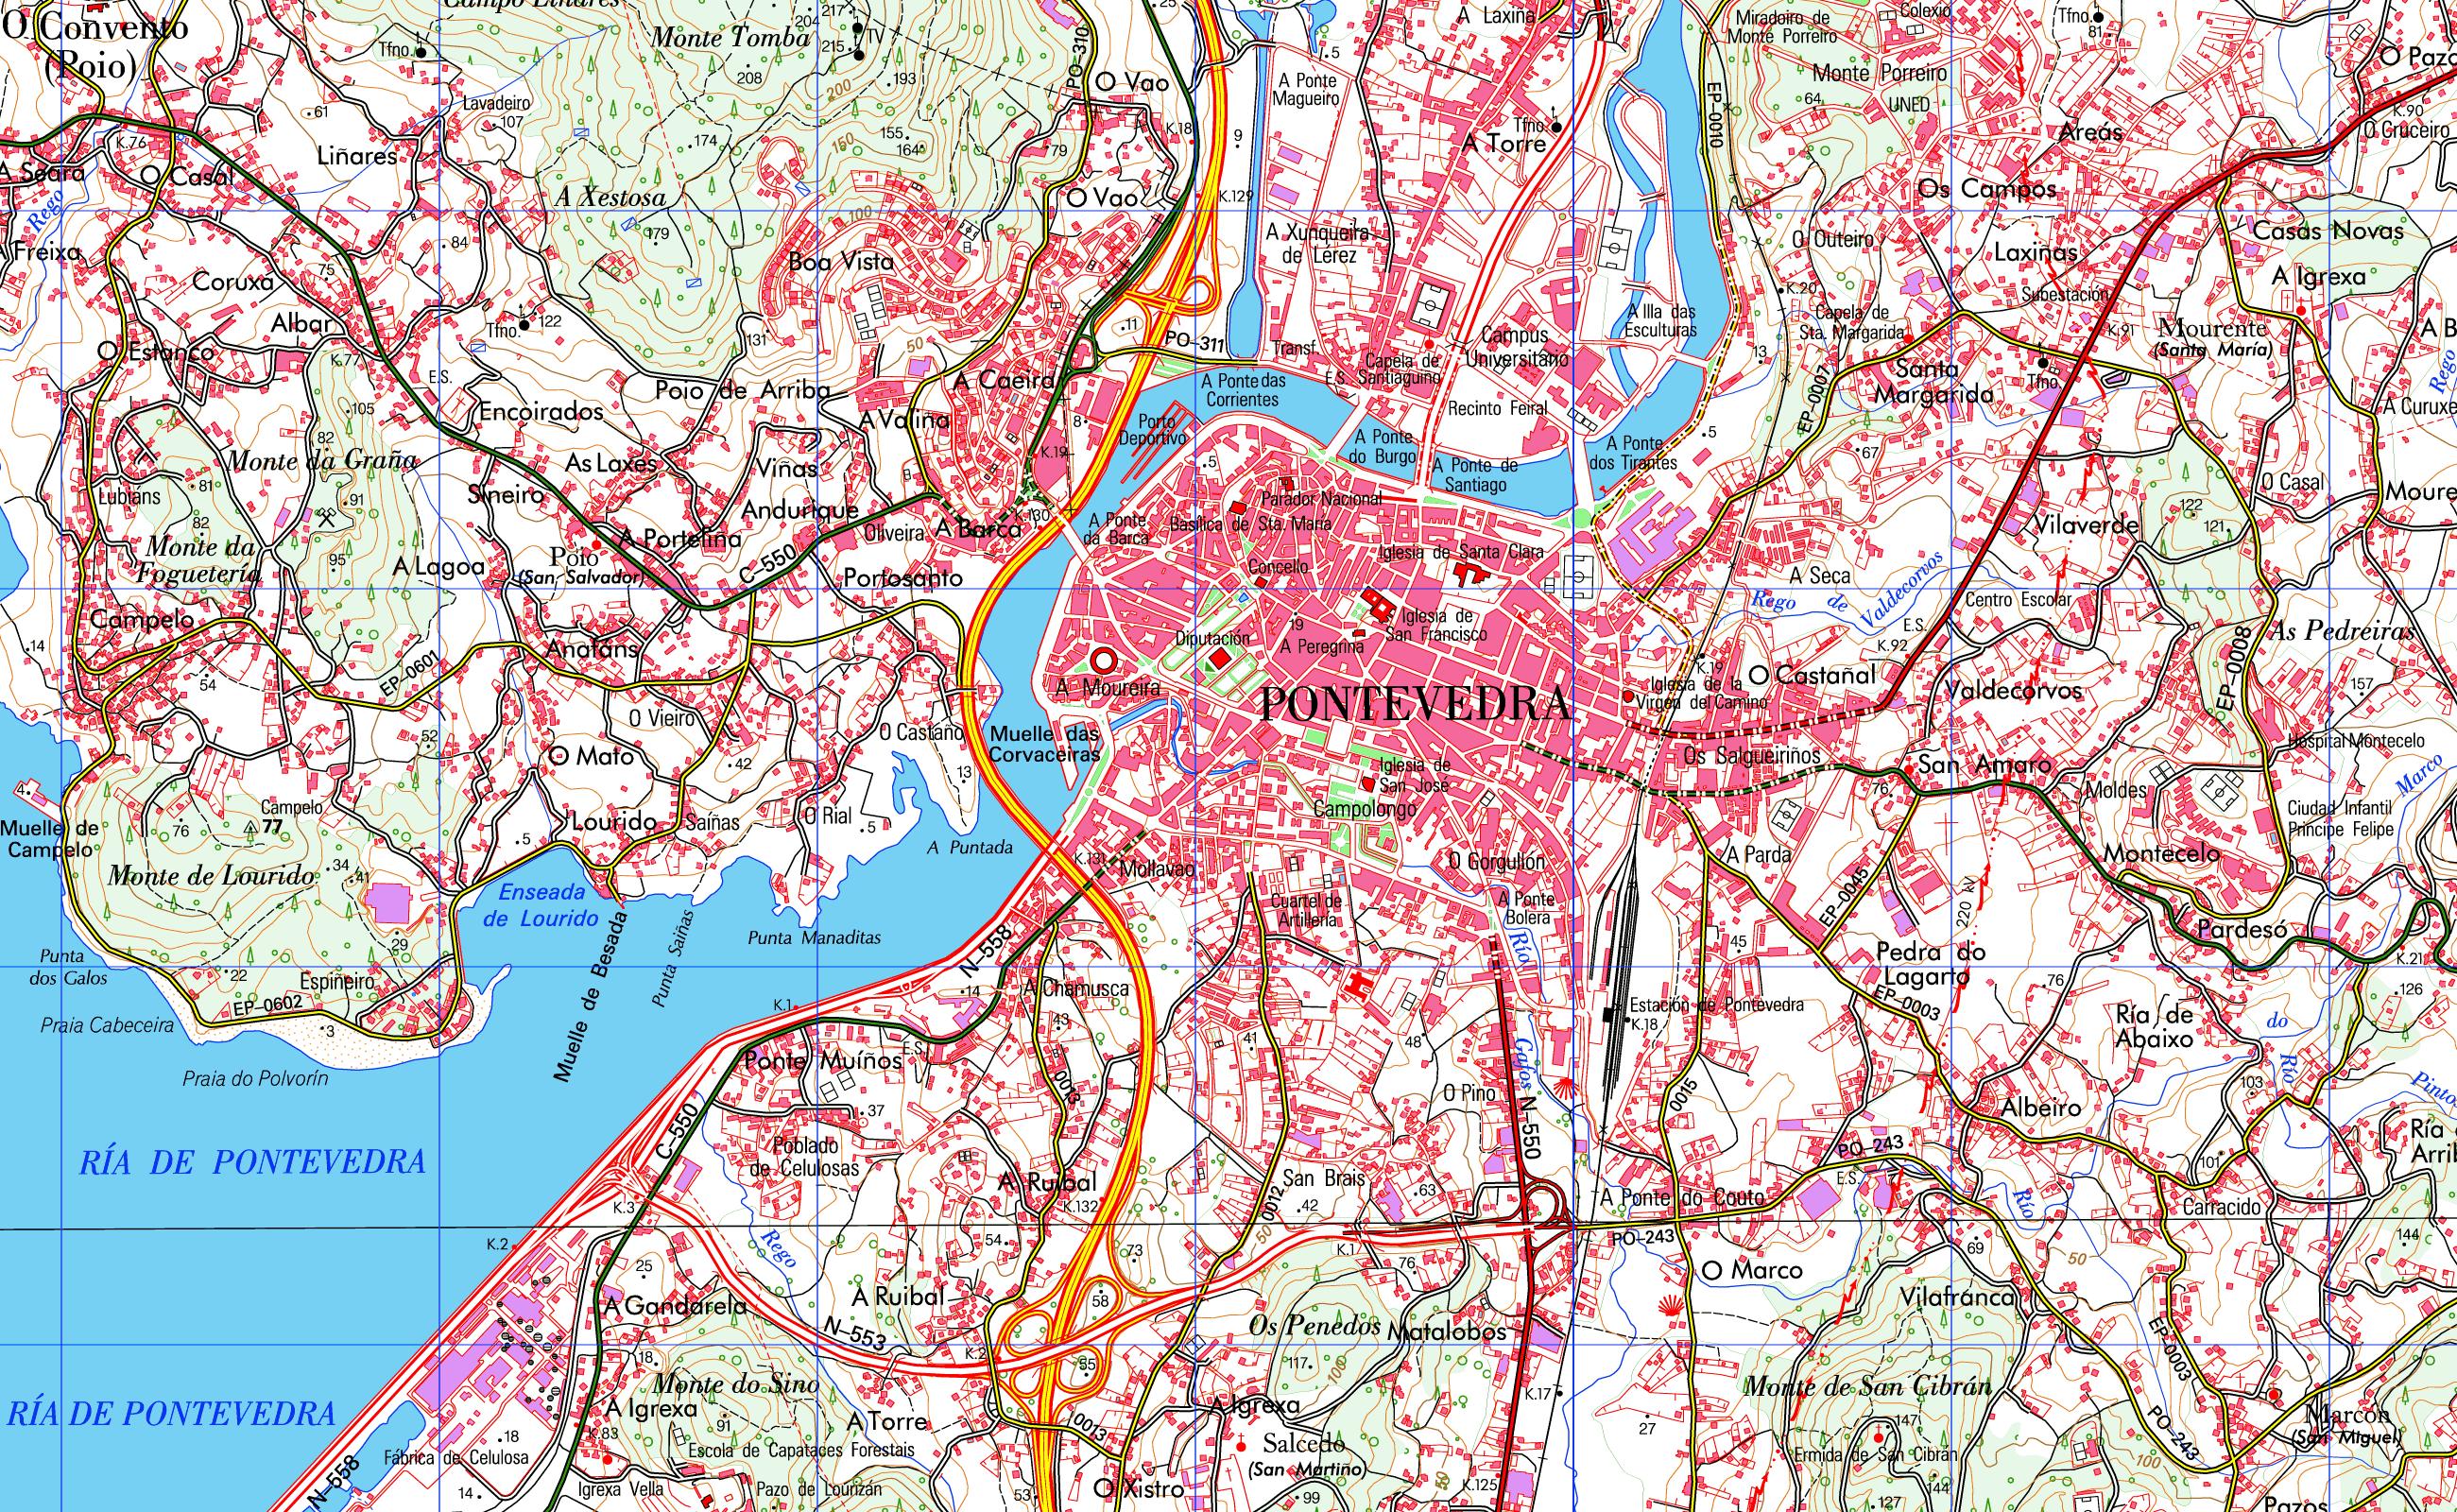 Mapa de Pontevedra